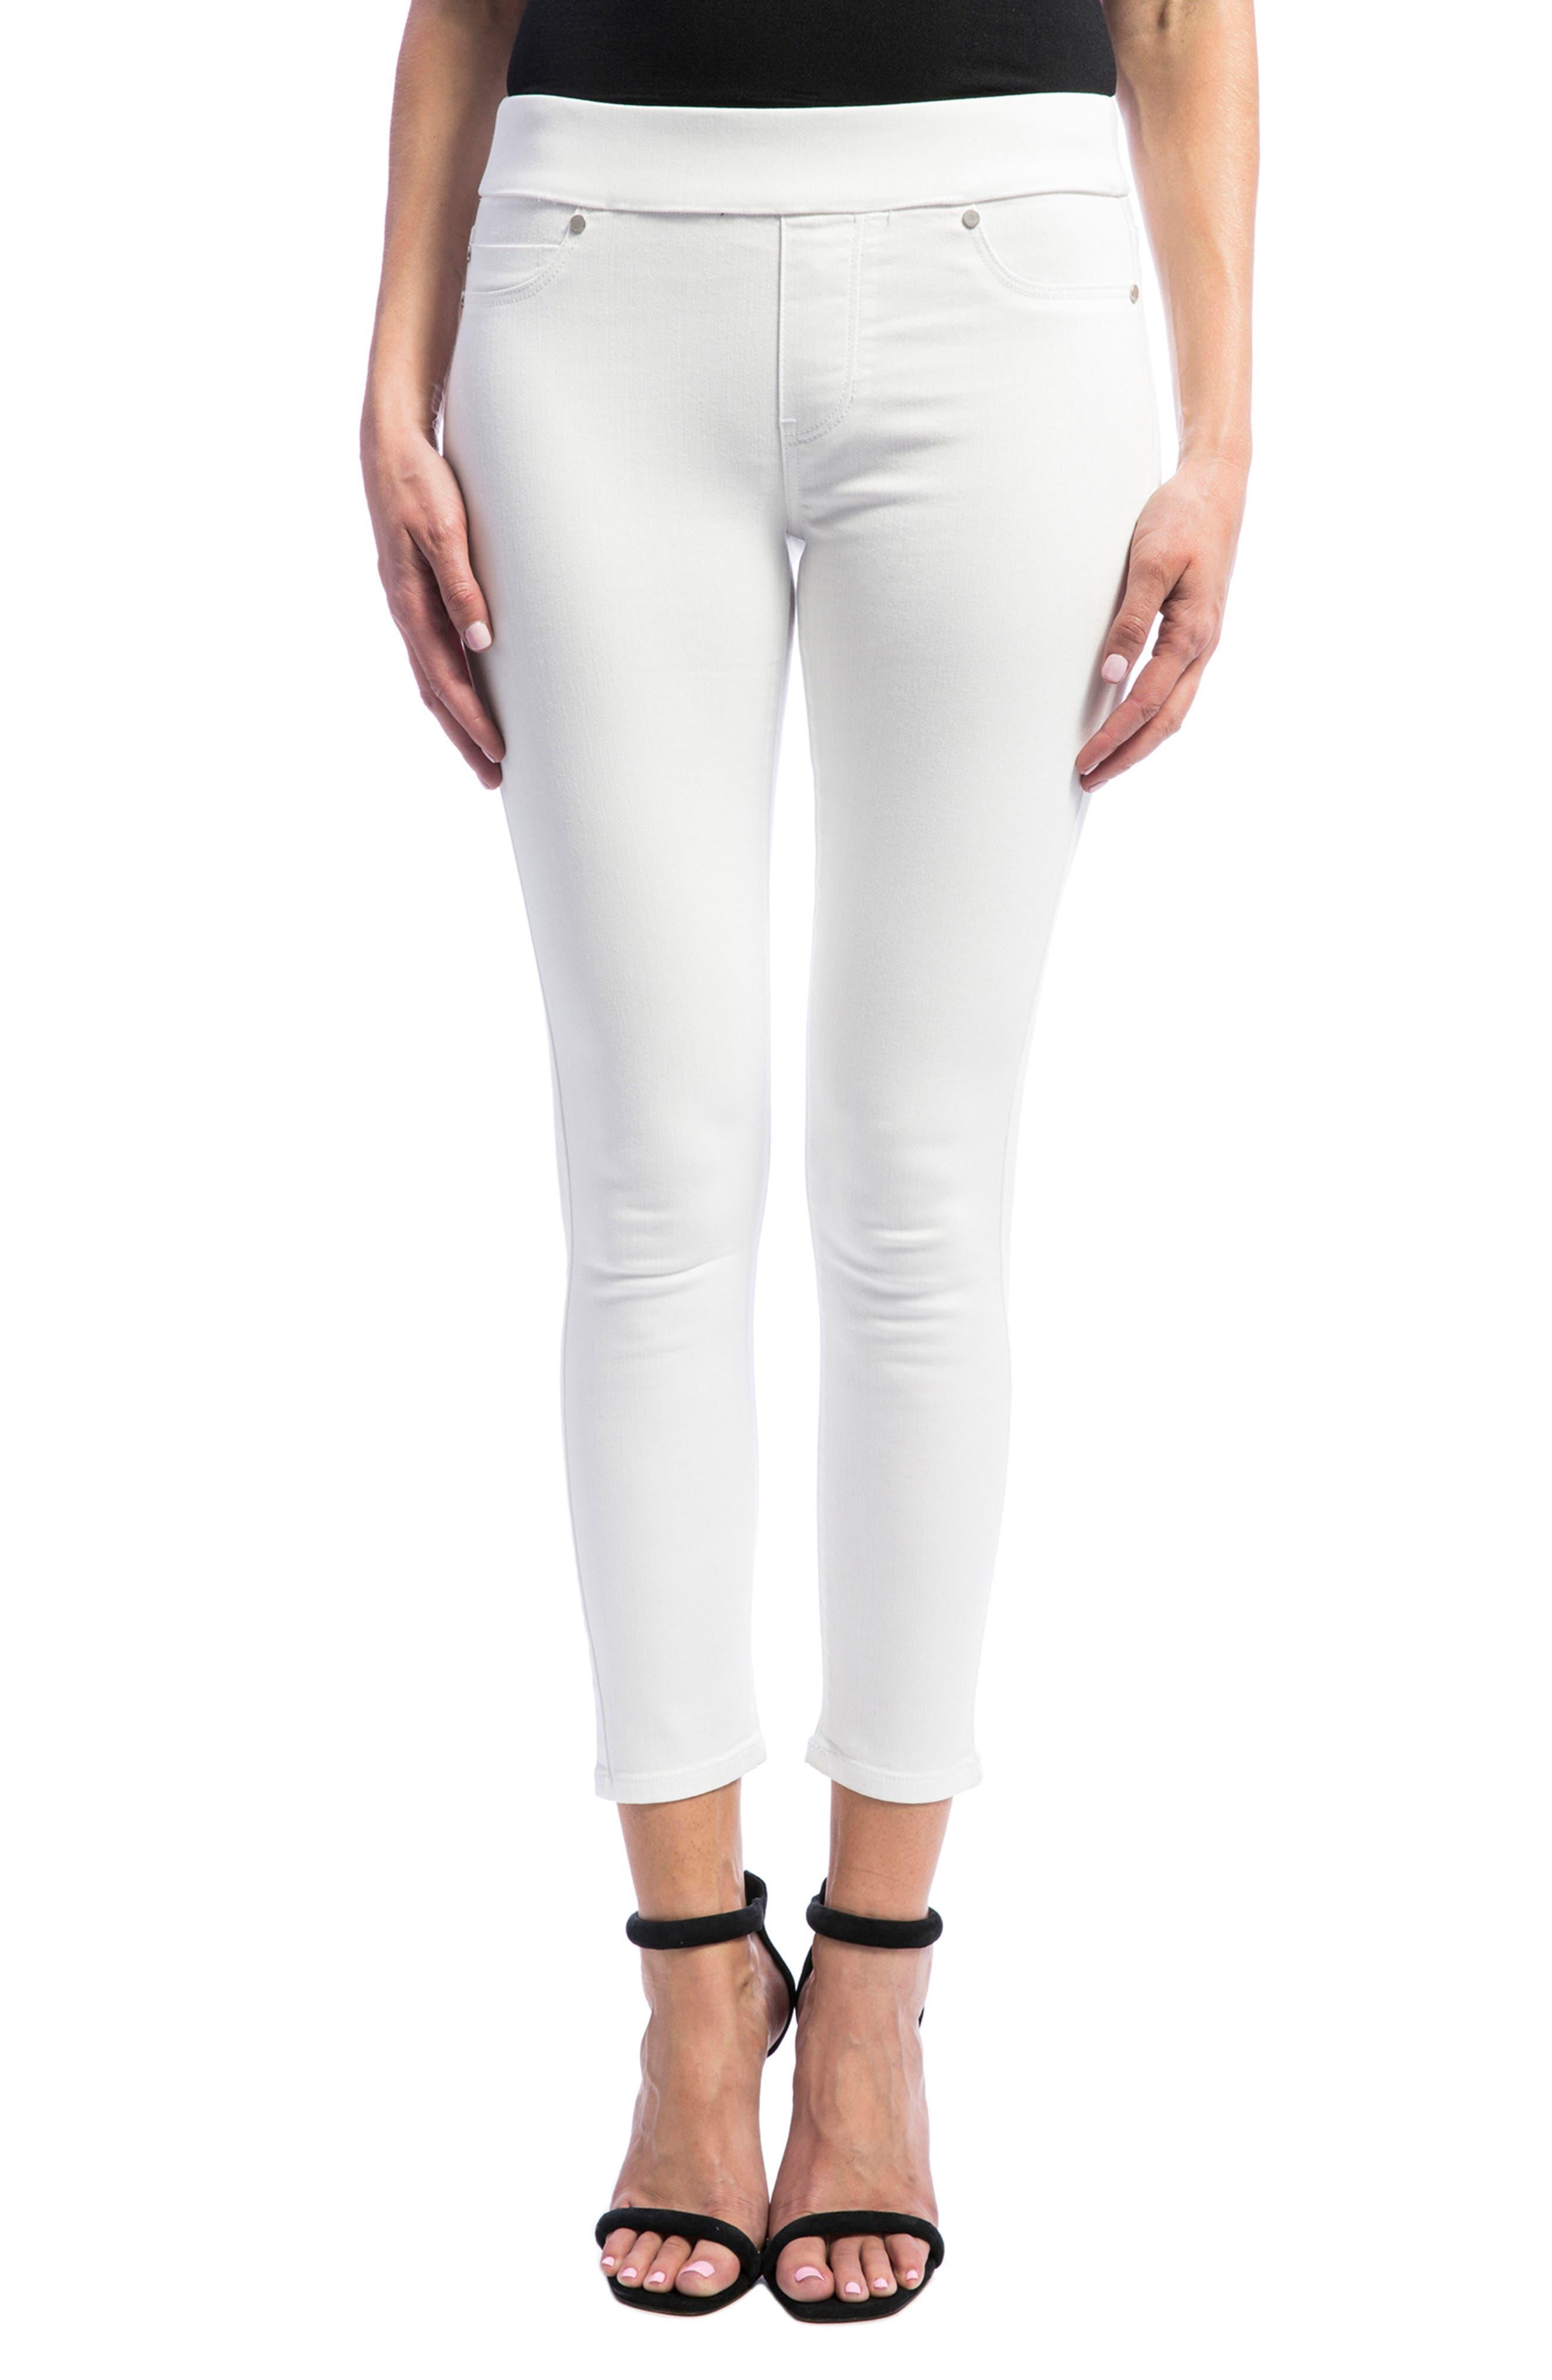 Sienna High Waist Pull-On Skinny Jeans